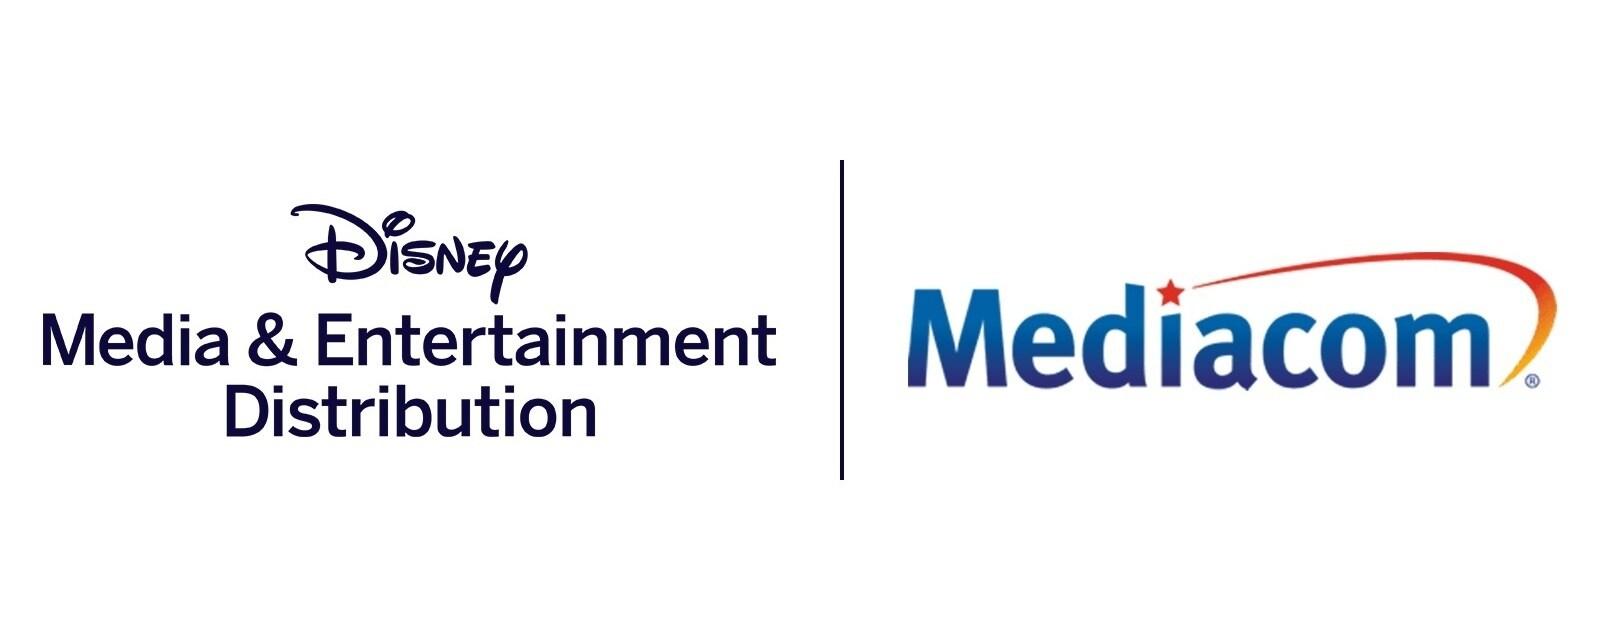 Disney Media & Entertainment Distribution and Mediacom logos